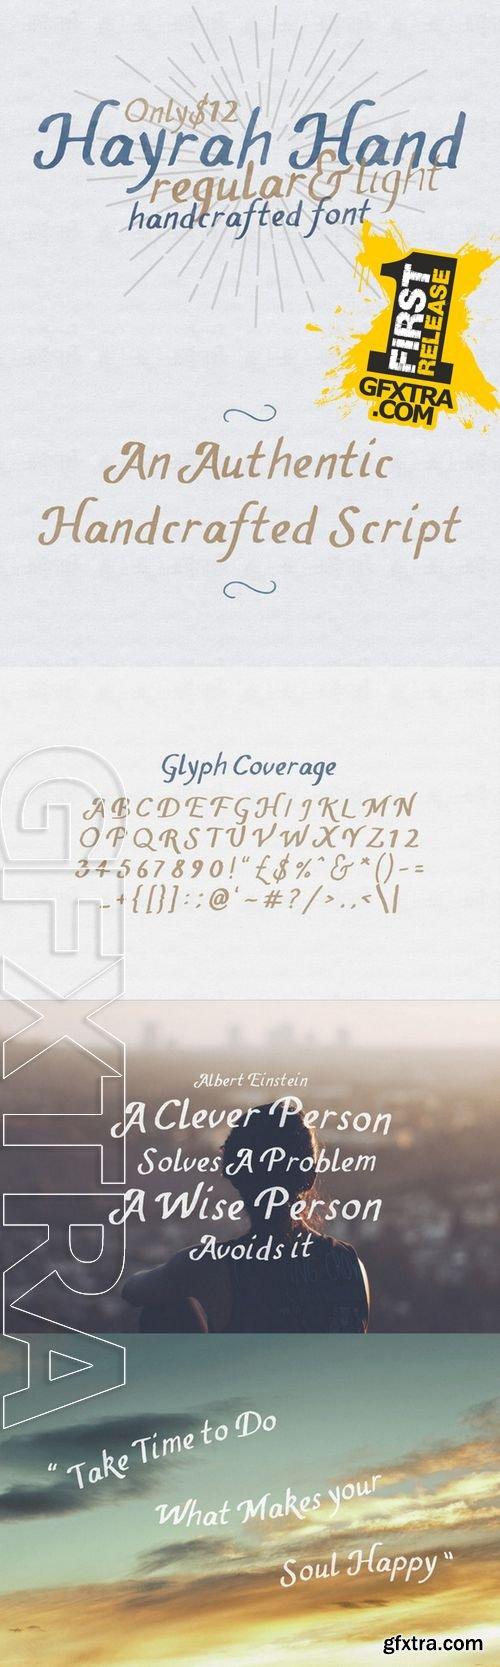 Hayrah Hand Script - CM 131254